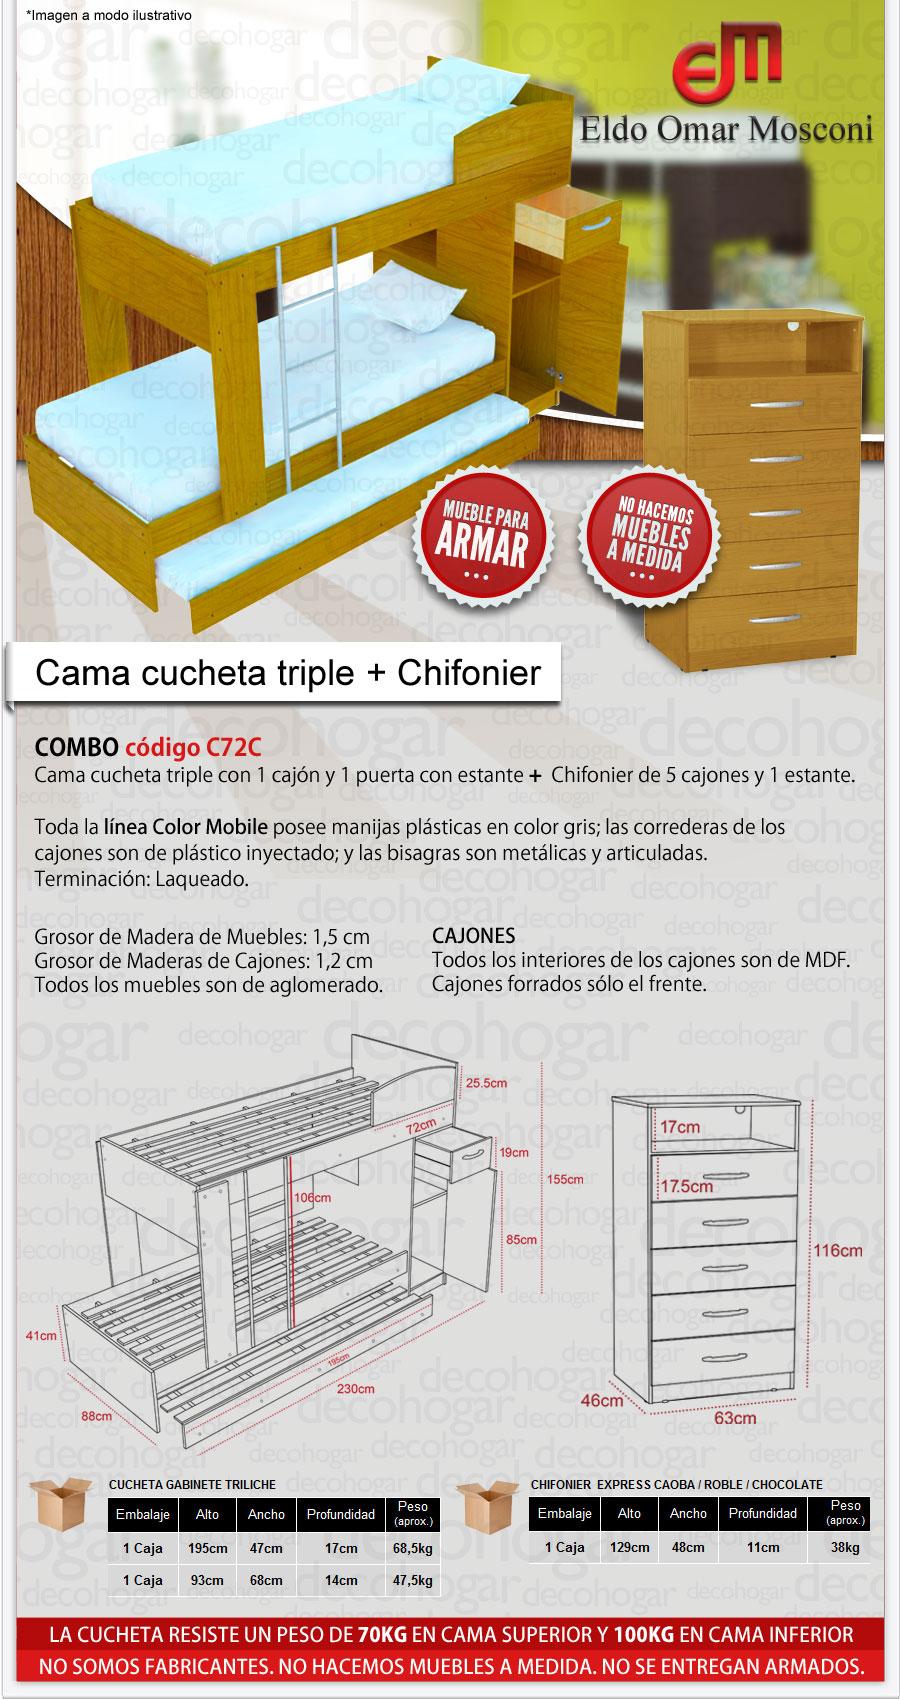 CAMA CUCHETA + CHIFONIER MOSCONI